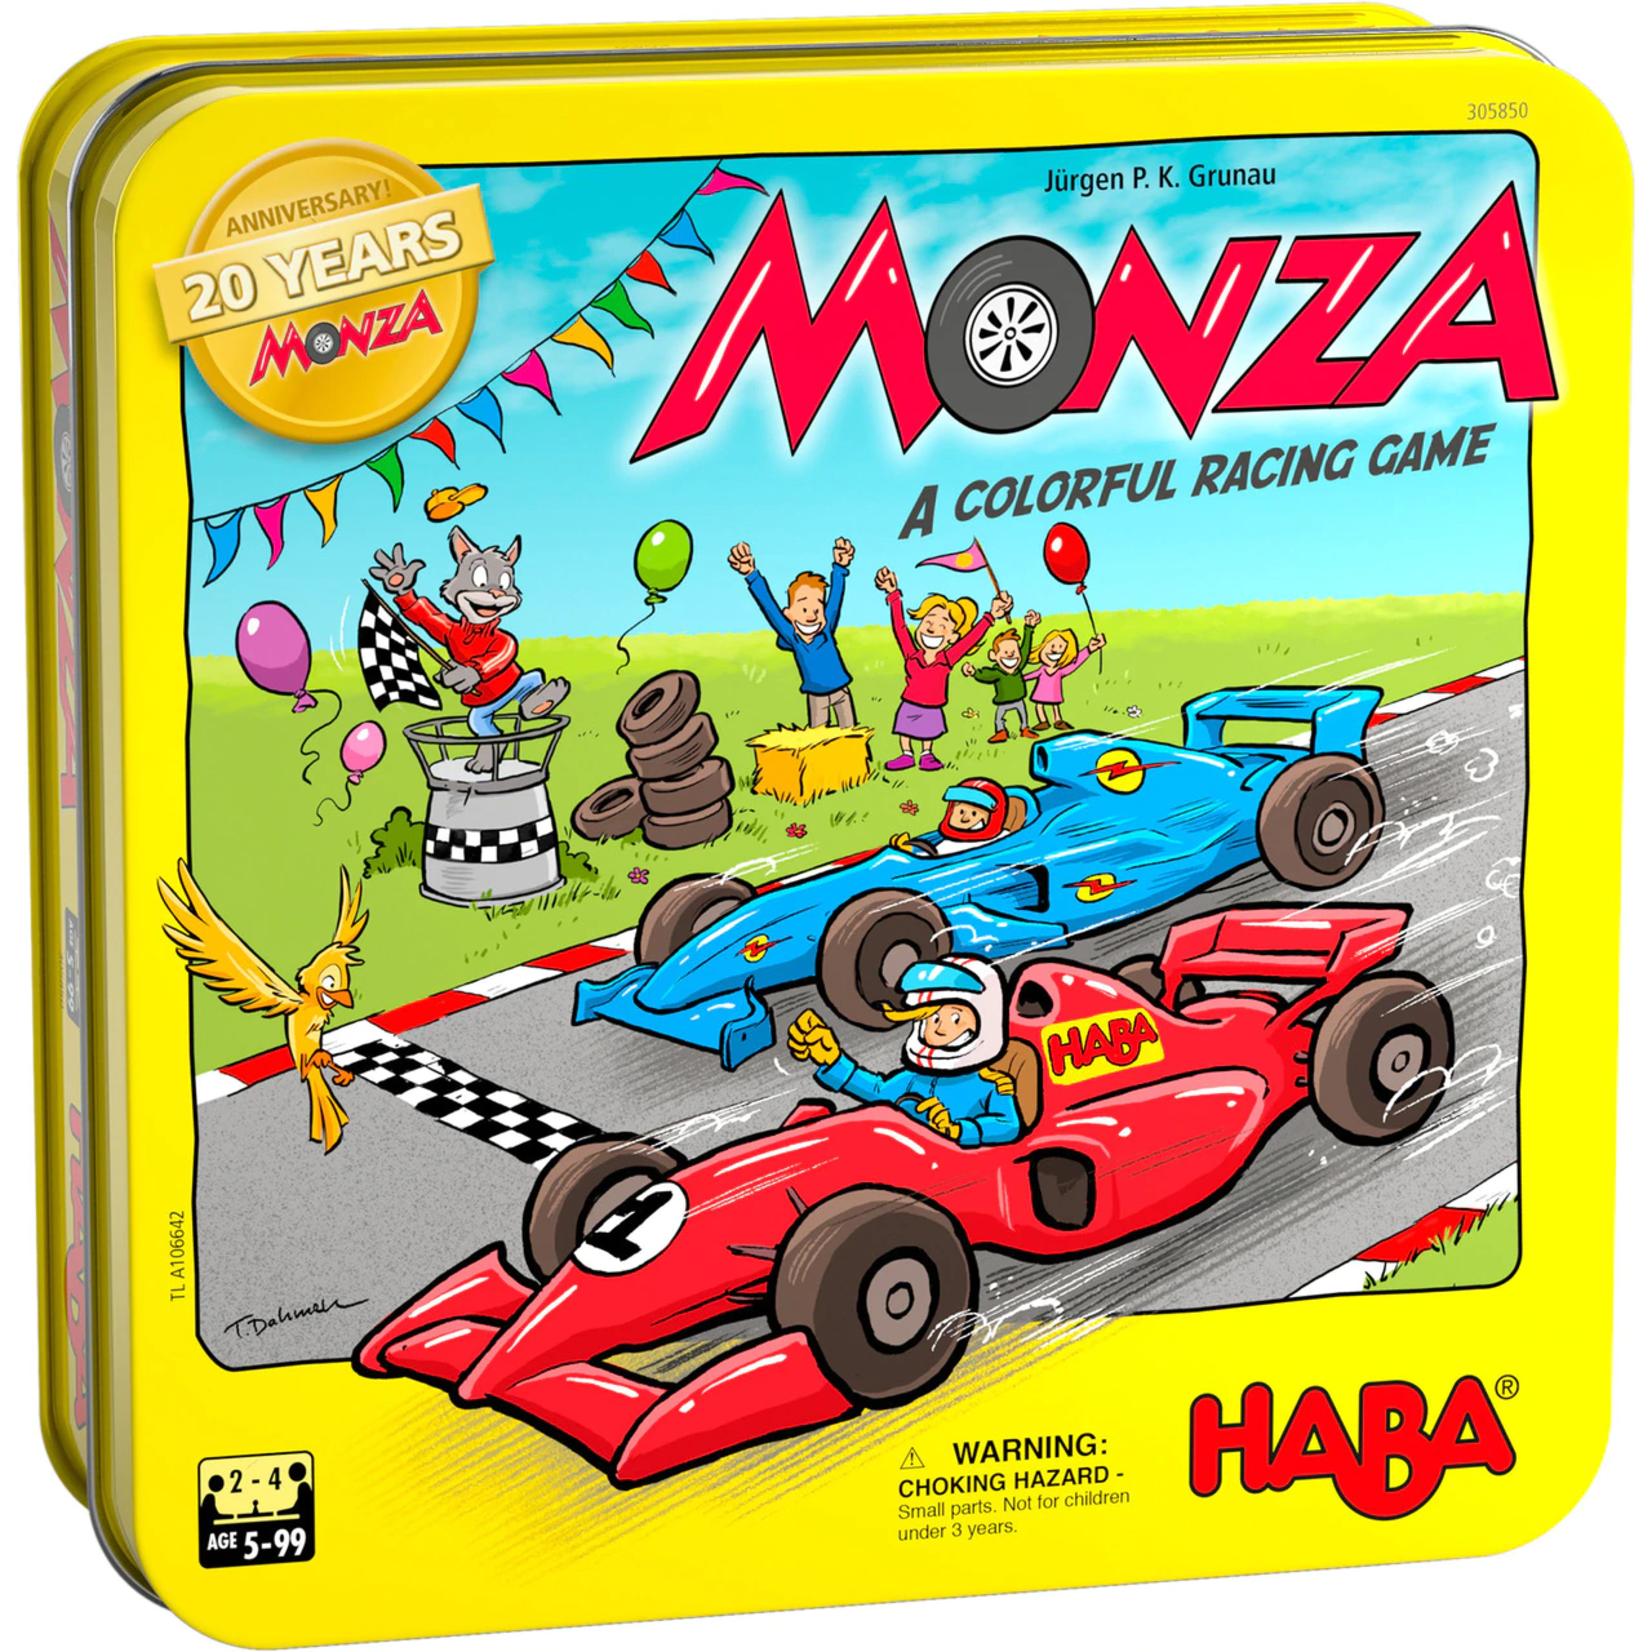 Haba Monza 20th Anniversary Edition